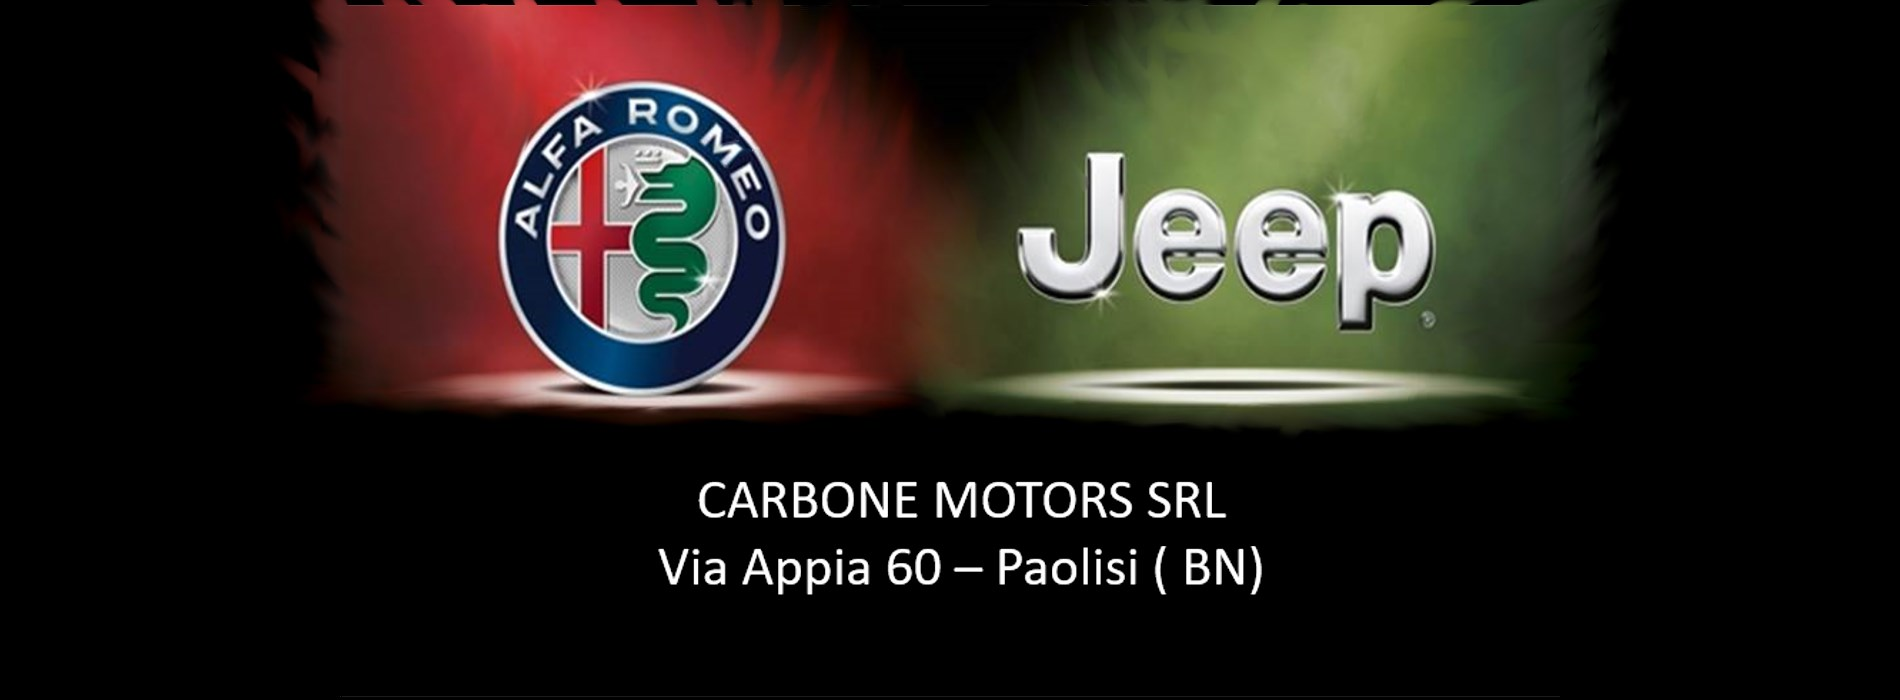 carbone-motors-concessionaria-alfaromeo-jeep